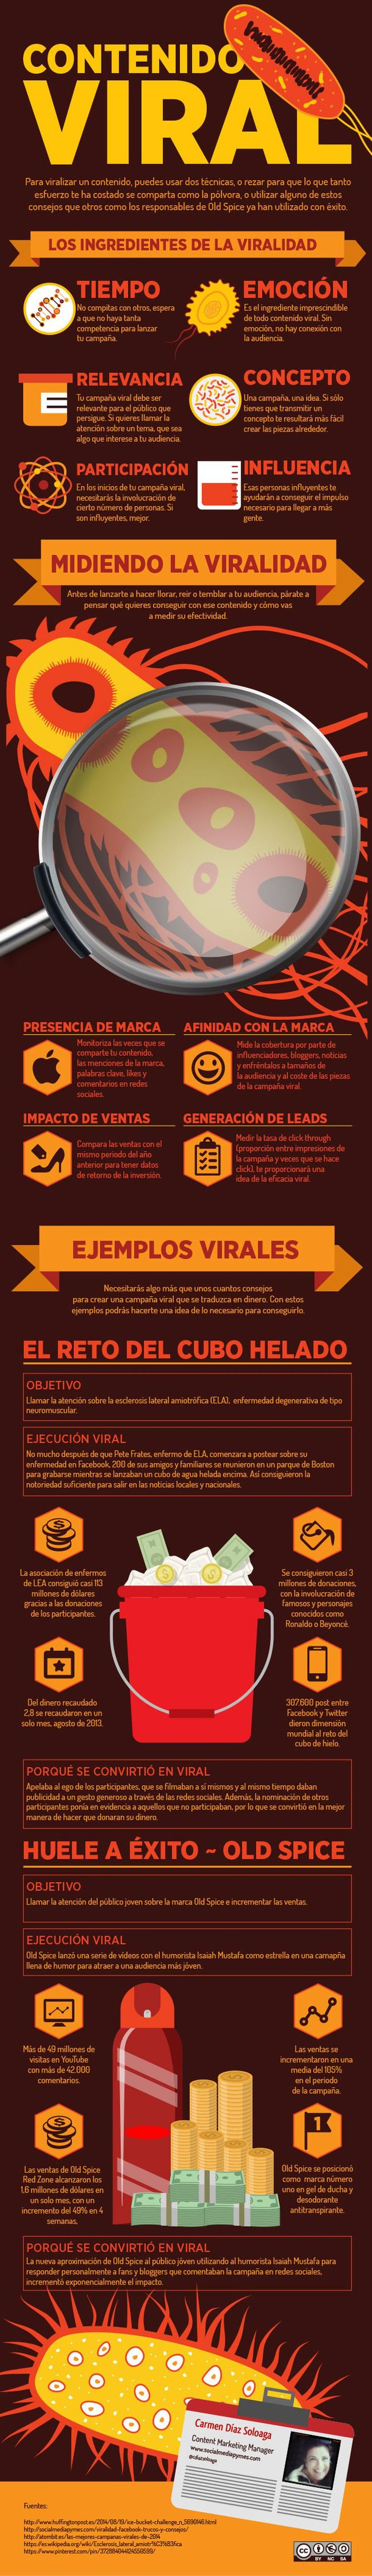 Ingredientes necesarios para crear contenido viral (infografía)